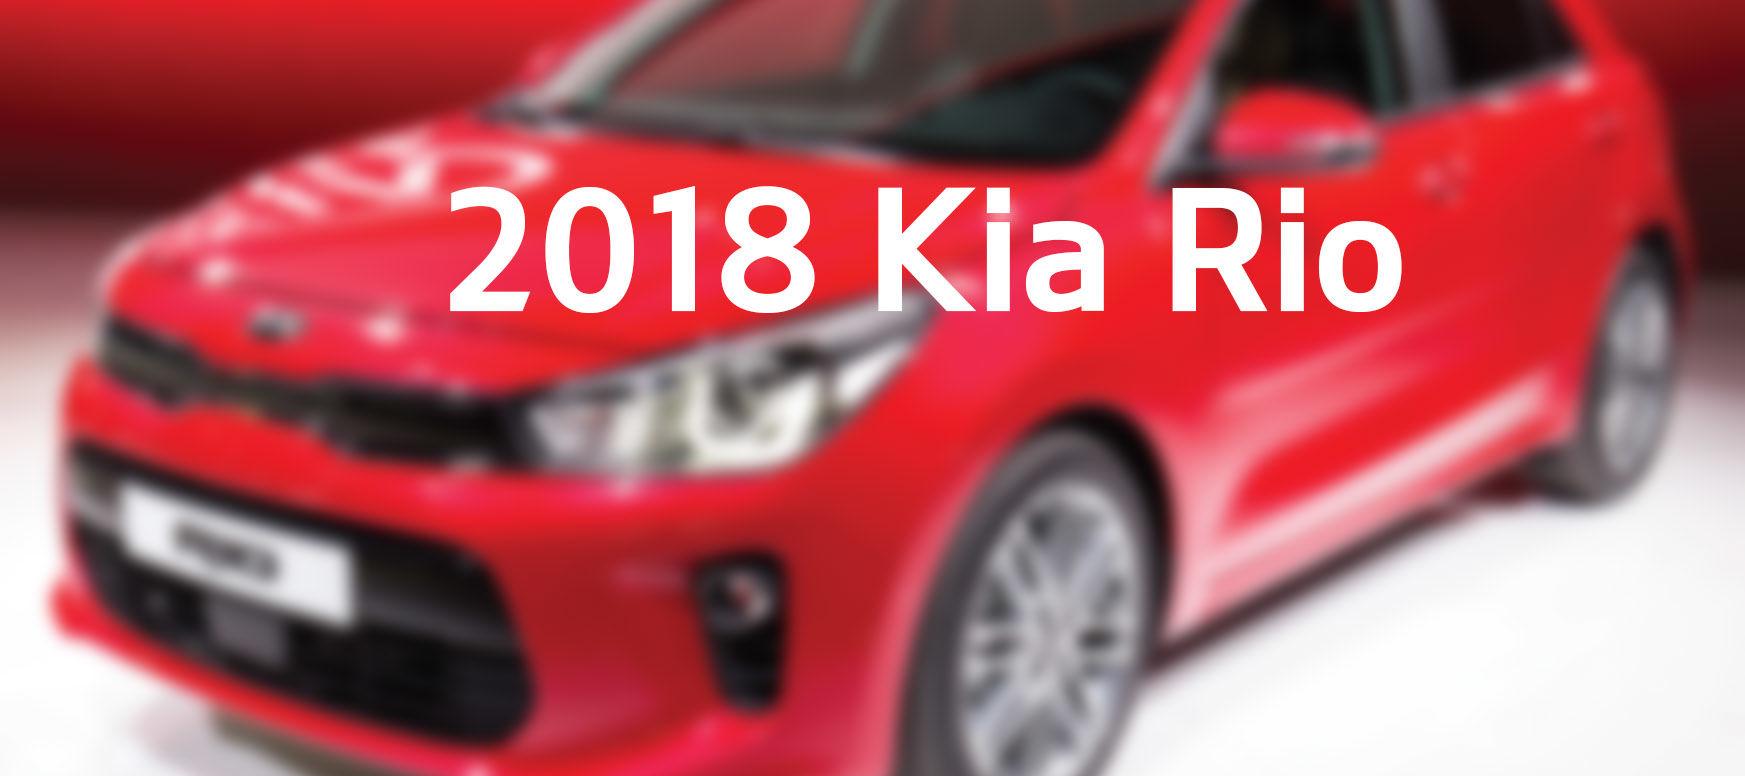 2018 Kia Rio: The Car & Driver Review